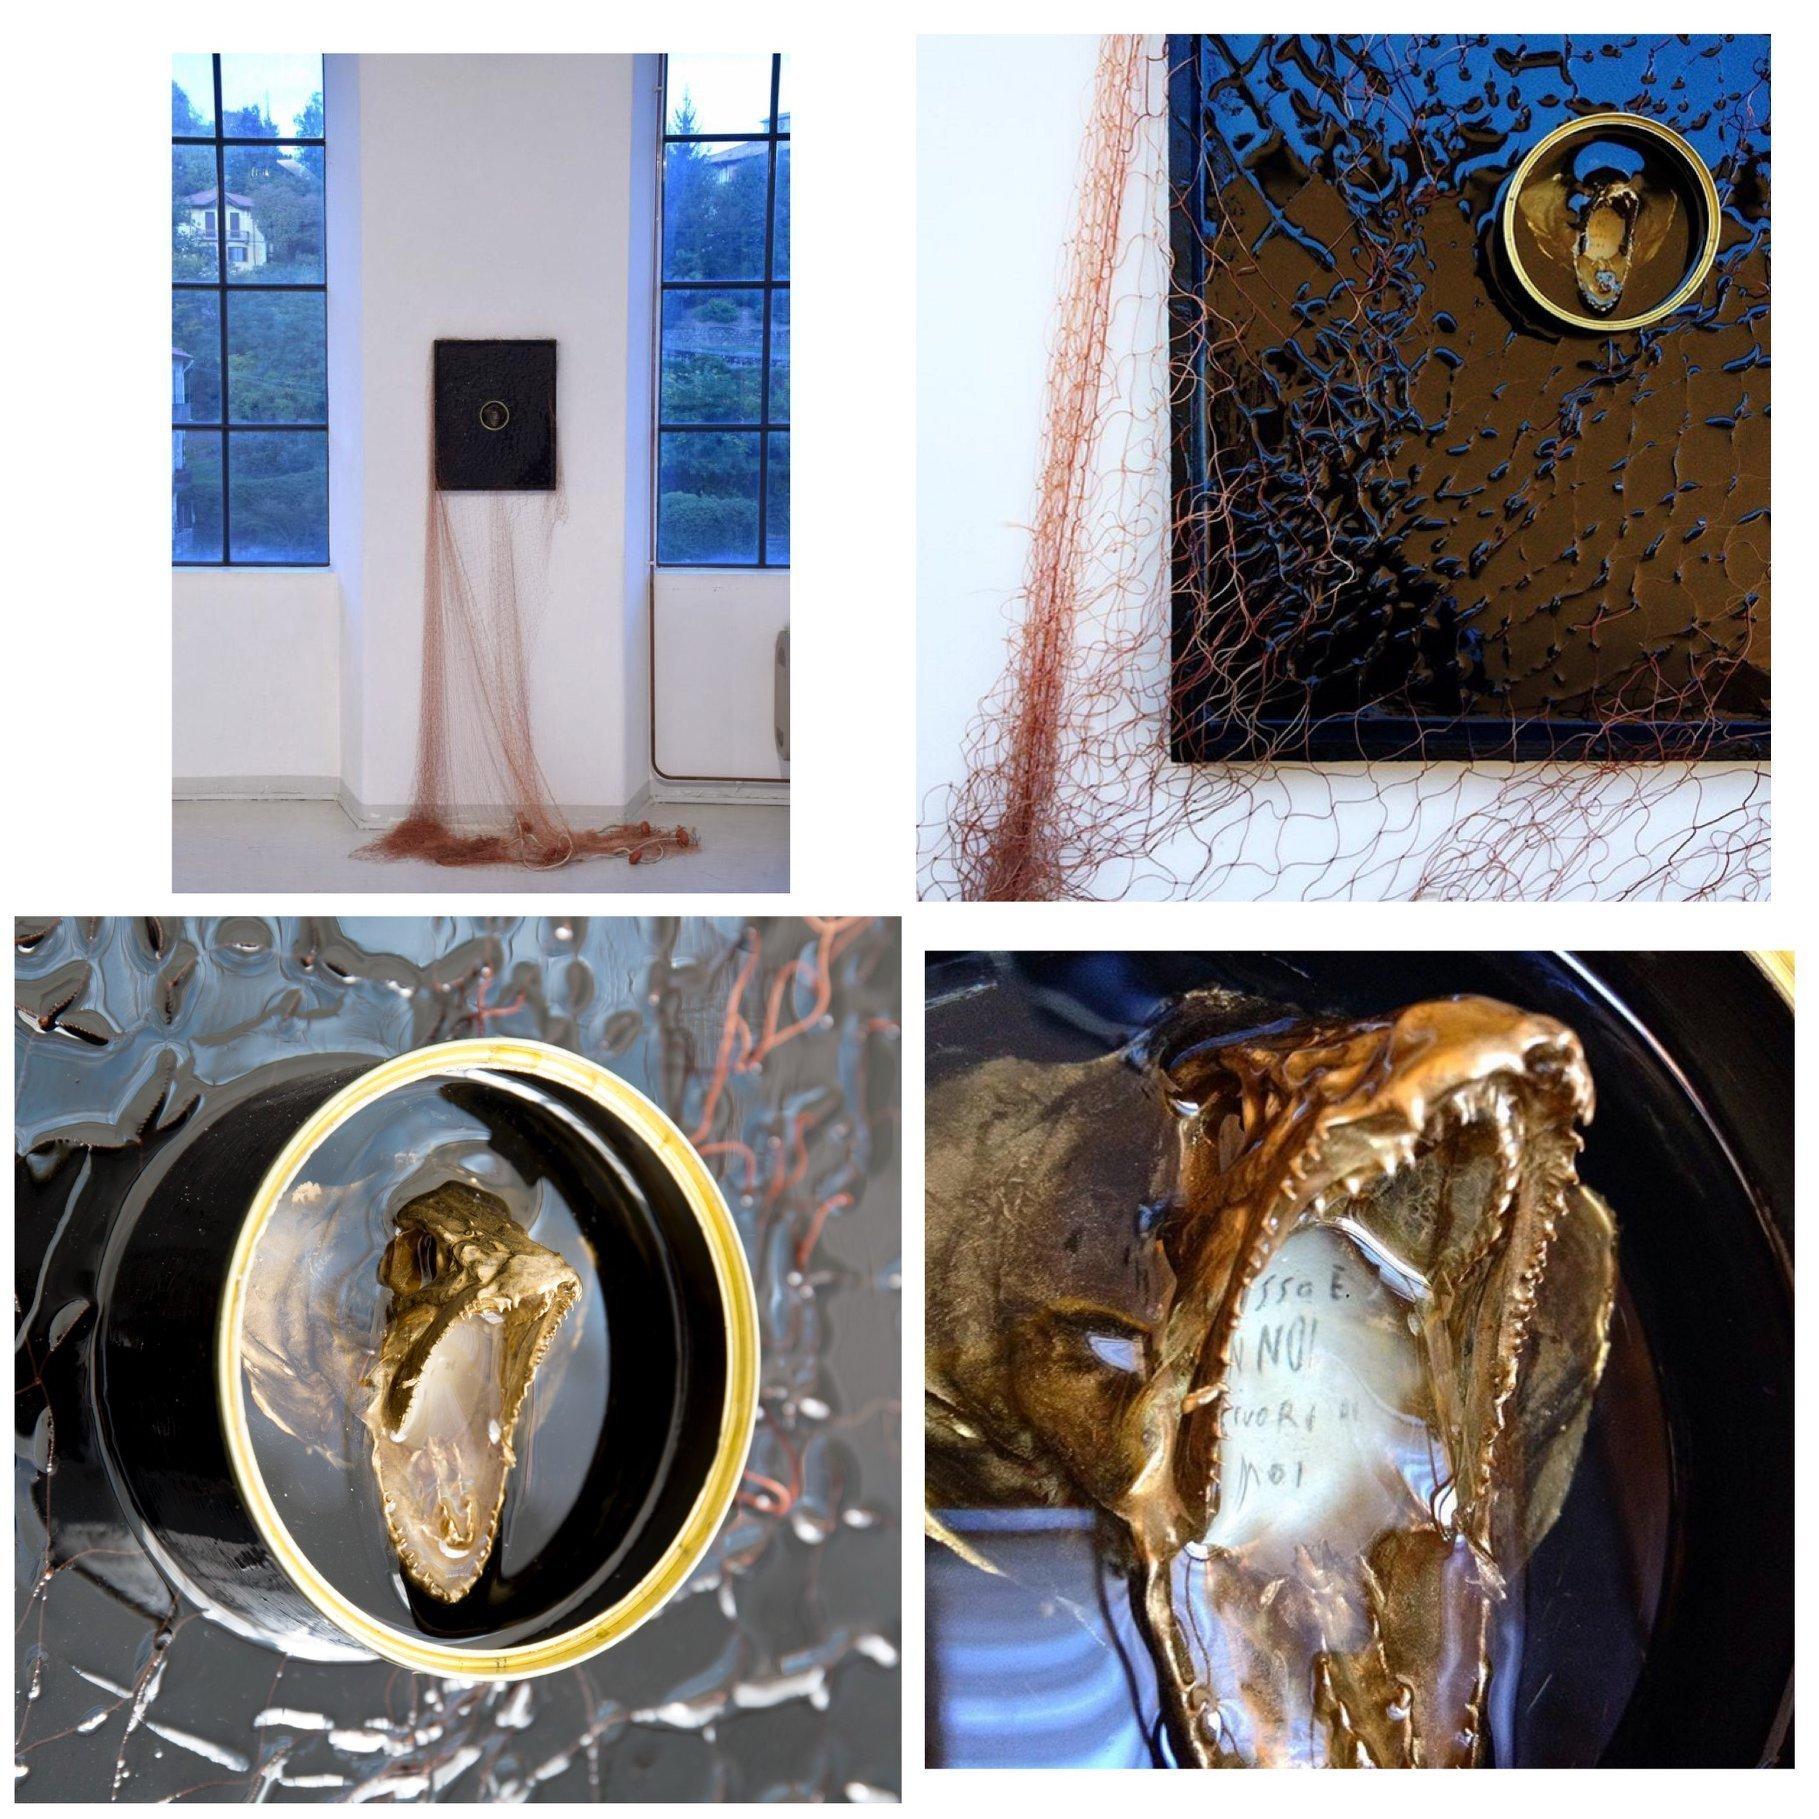 Elisa Baldissera - Overfishing #2 - Tecnica mista (testa di pesce, scritta su carta, rete da pesca, latta di tonno, resina epossidica, vernici) - 42 X 54 cm. (più rete) - 2017